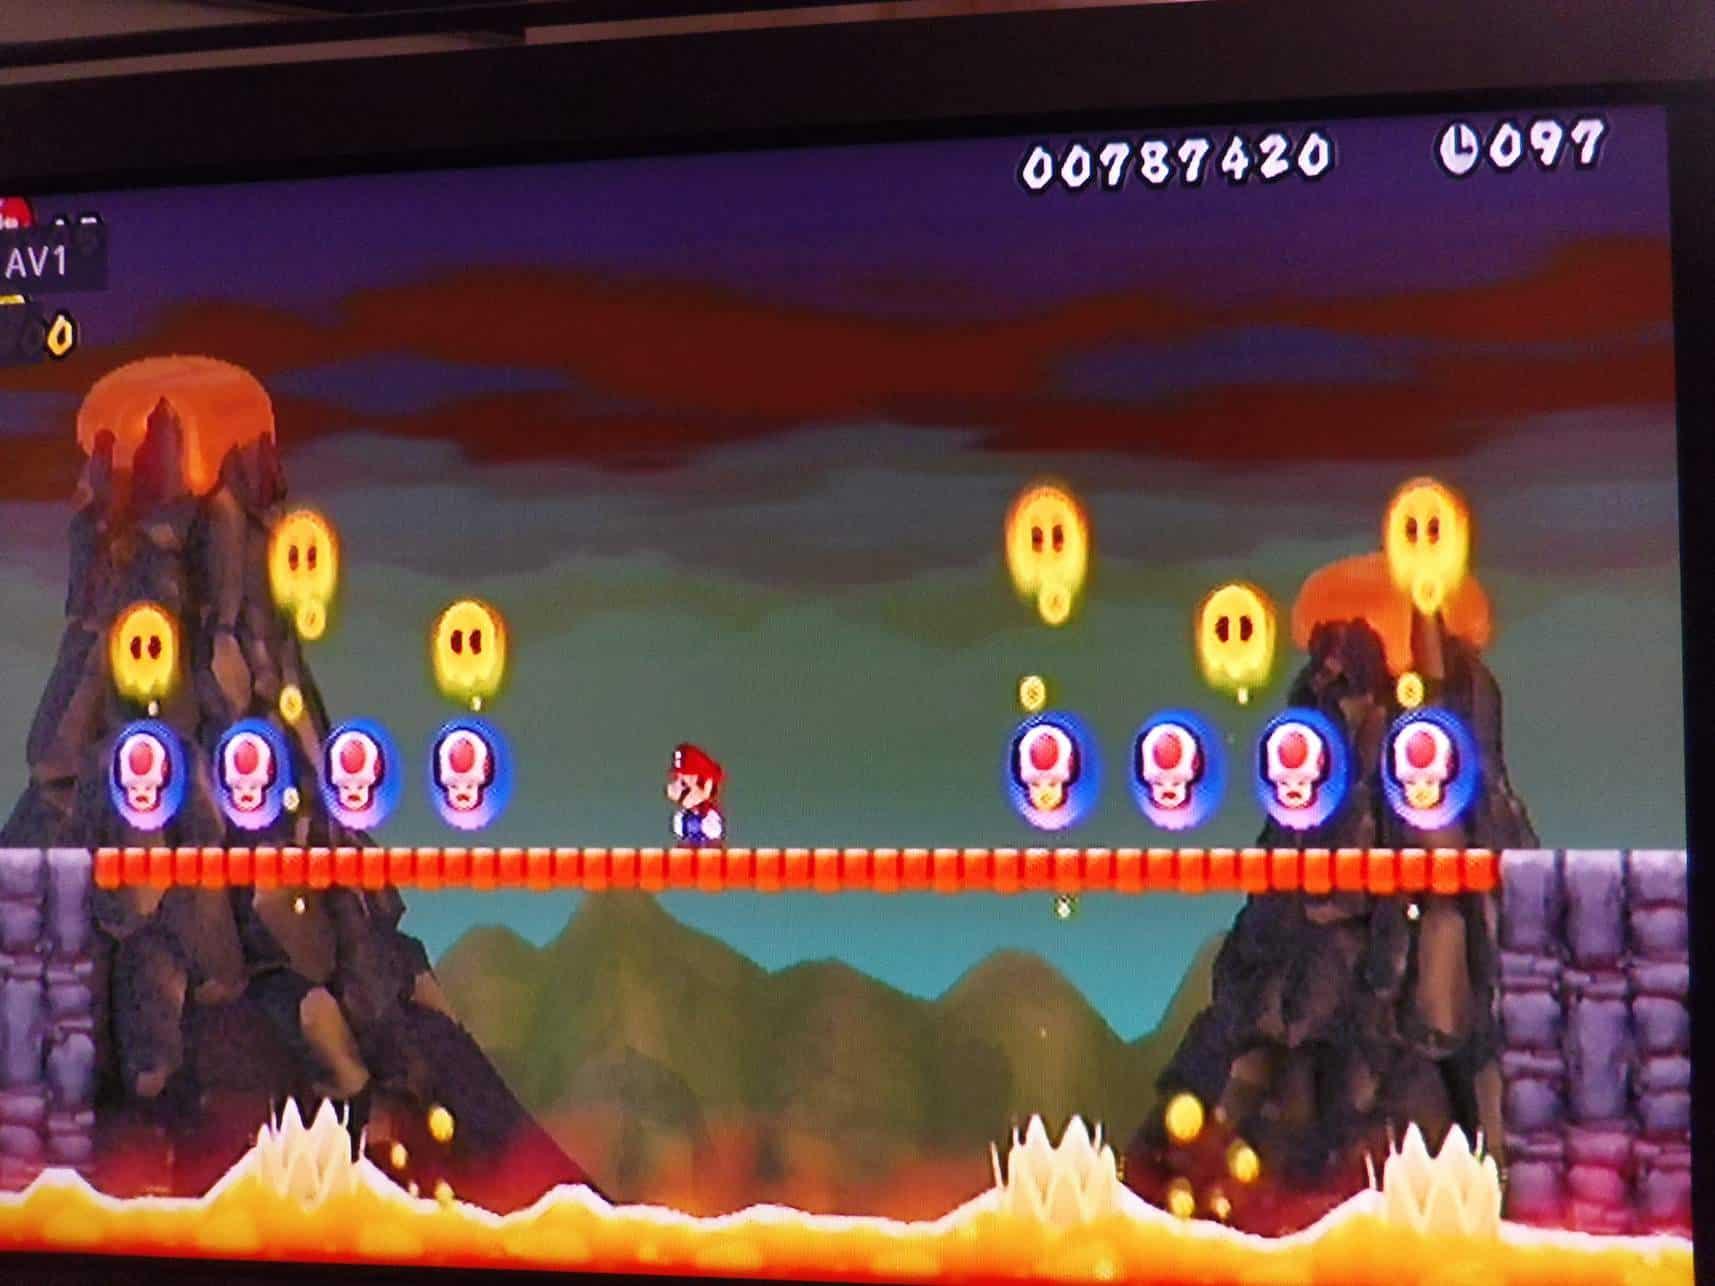 Wereld 8 uit Super Mario Bros. (c) srsck